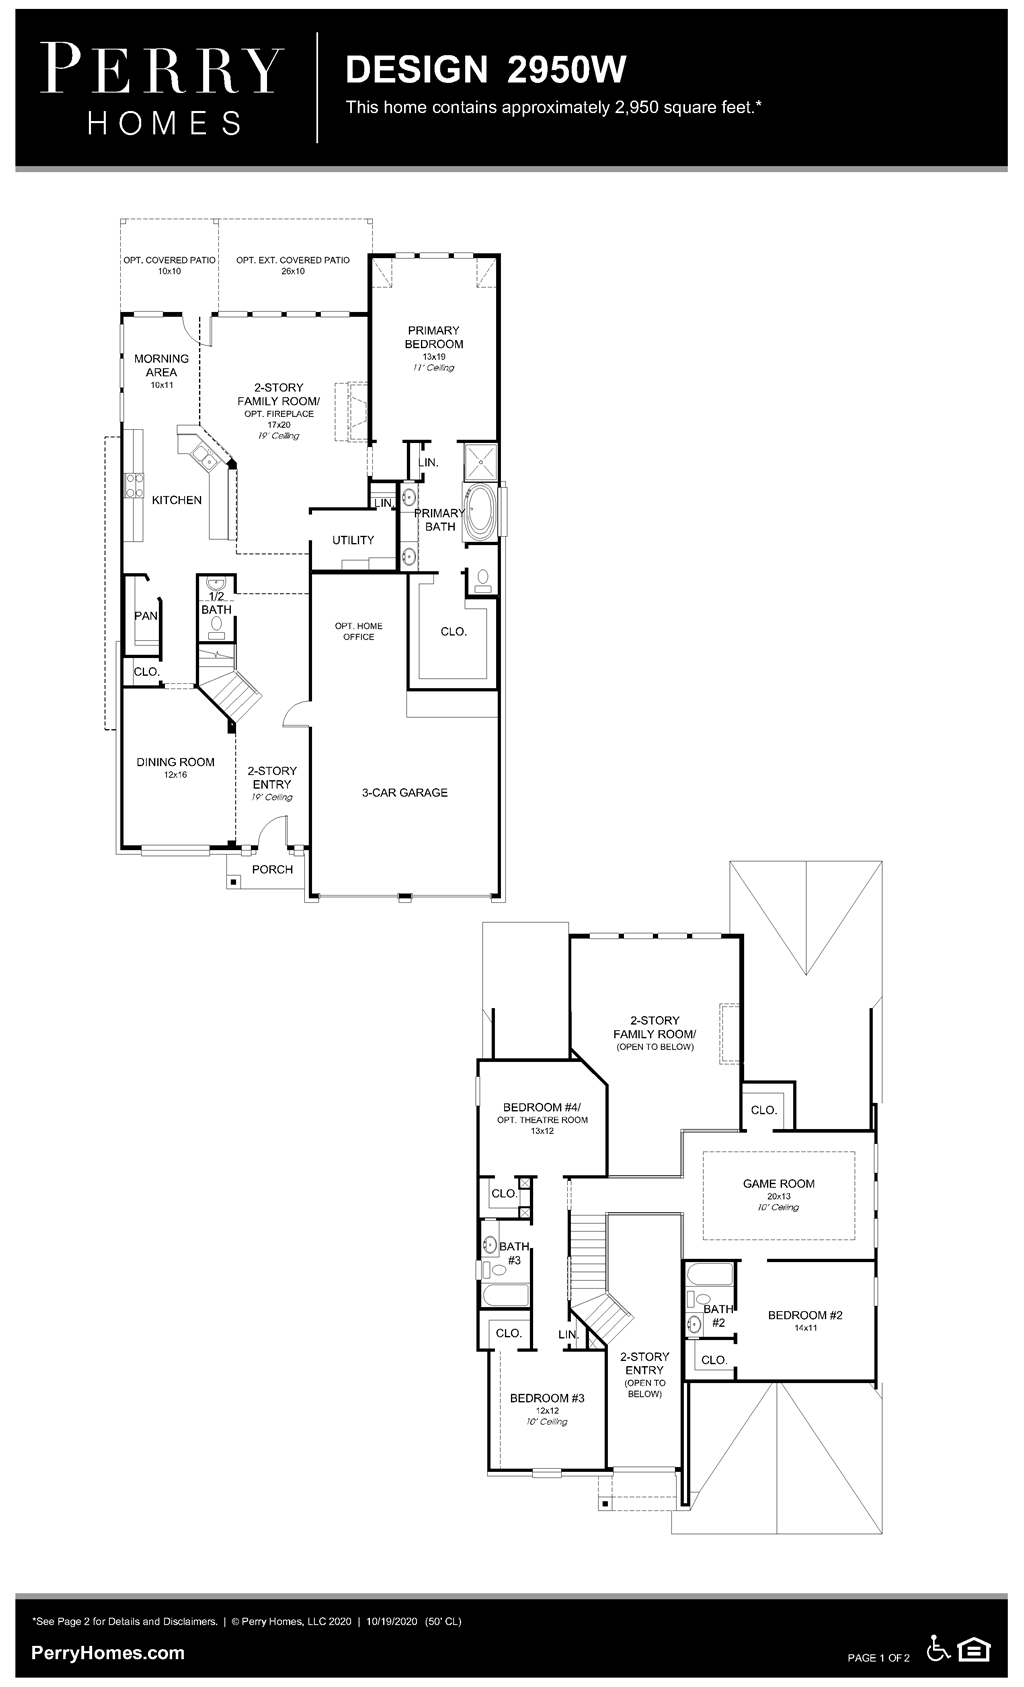 Floor Plan for 2950W